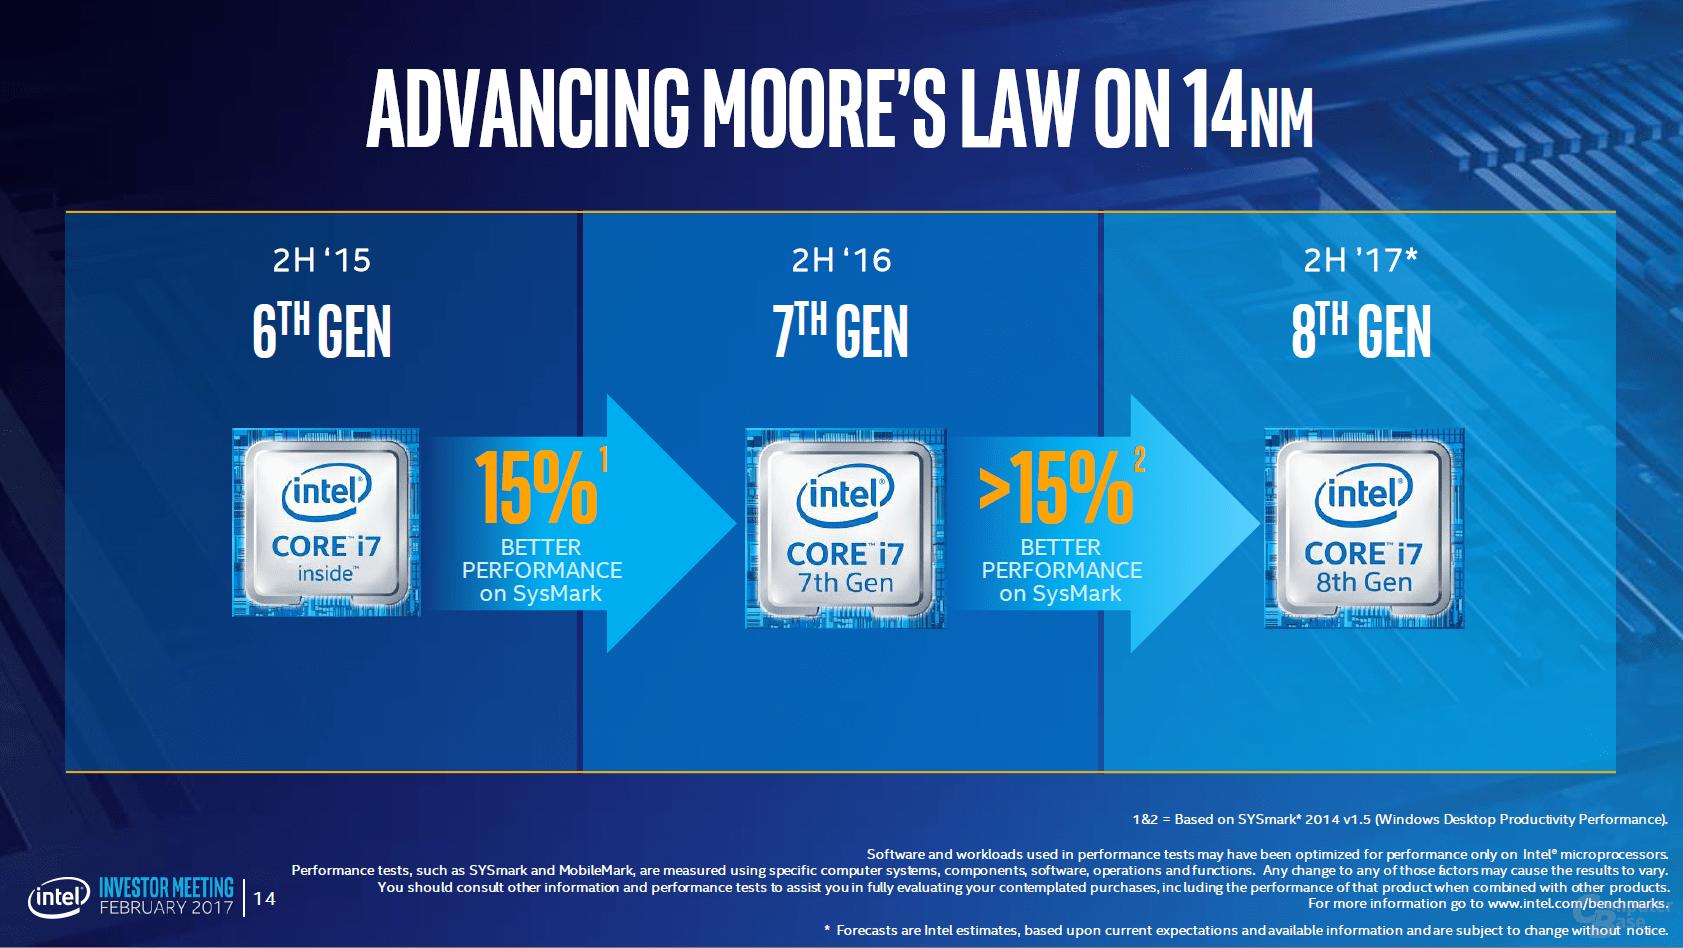 Intel Core I7 8000 Series 8th Generation Processors Are 15 Faster